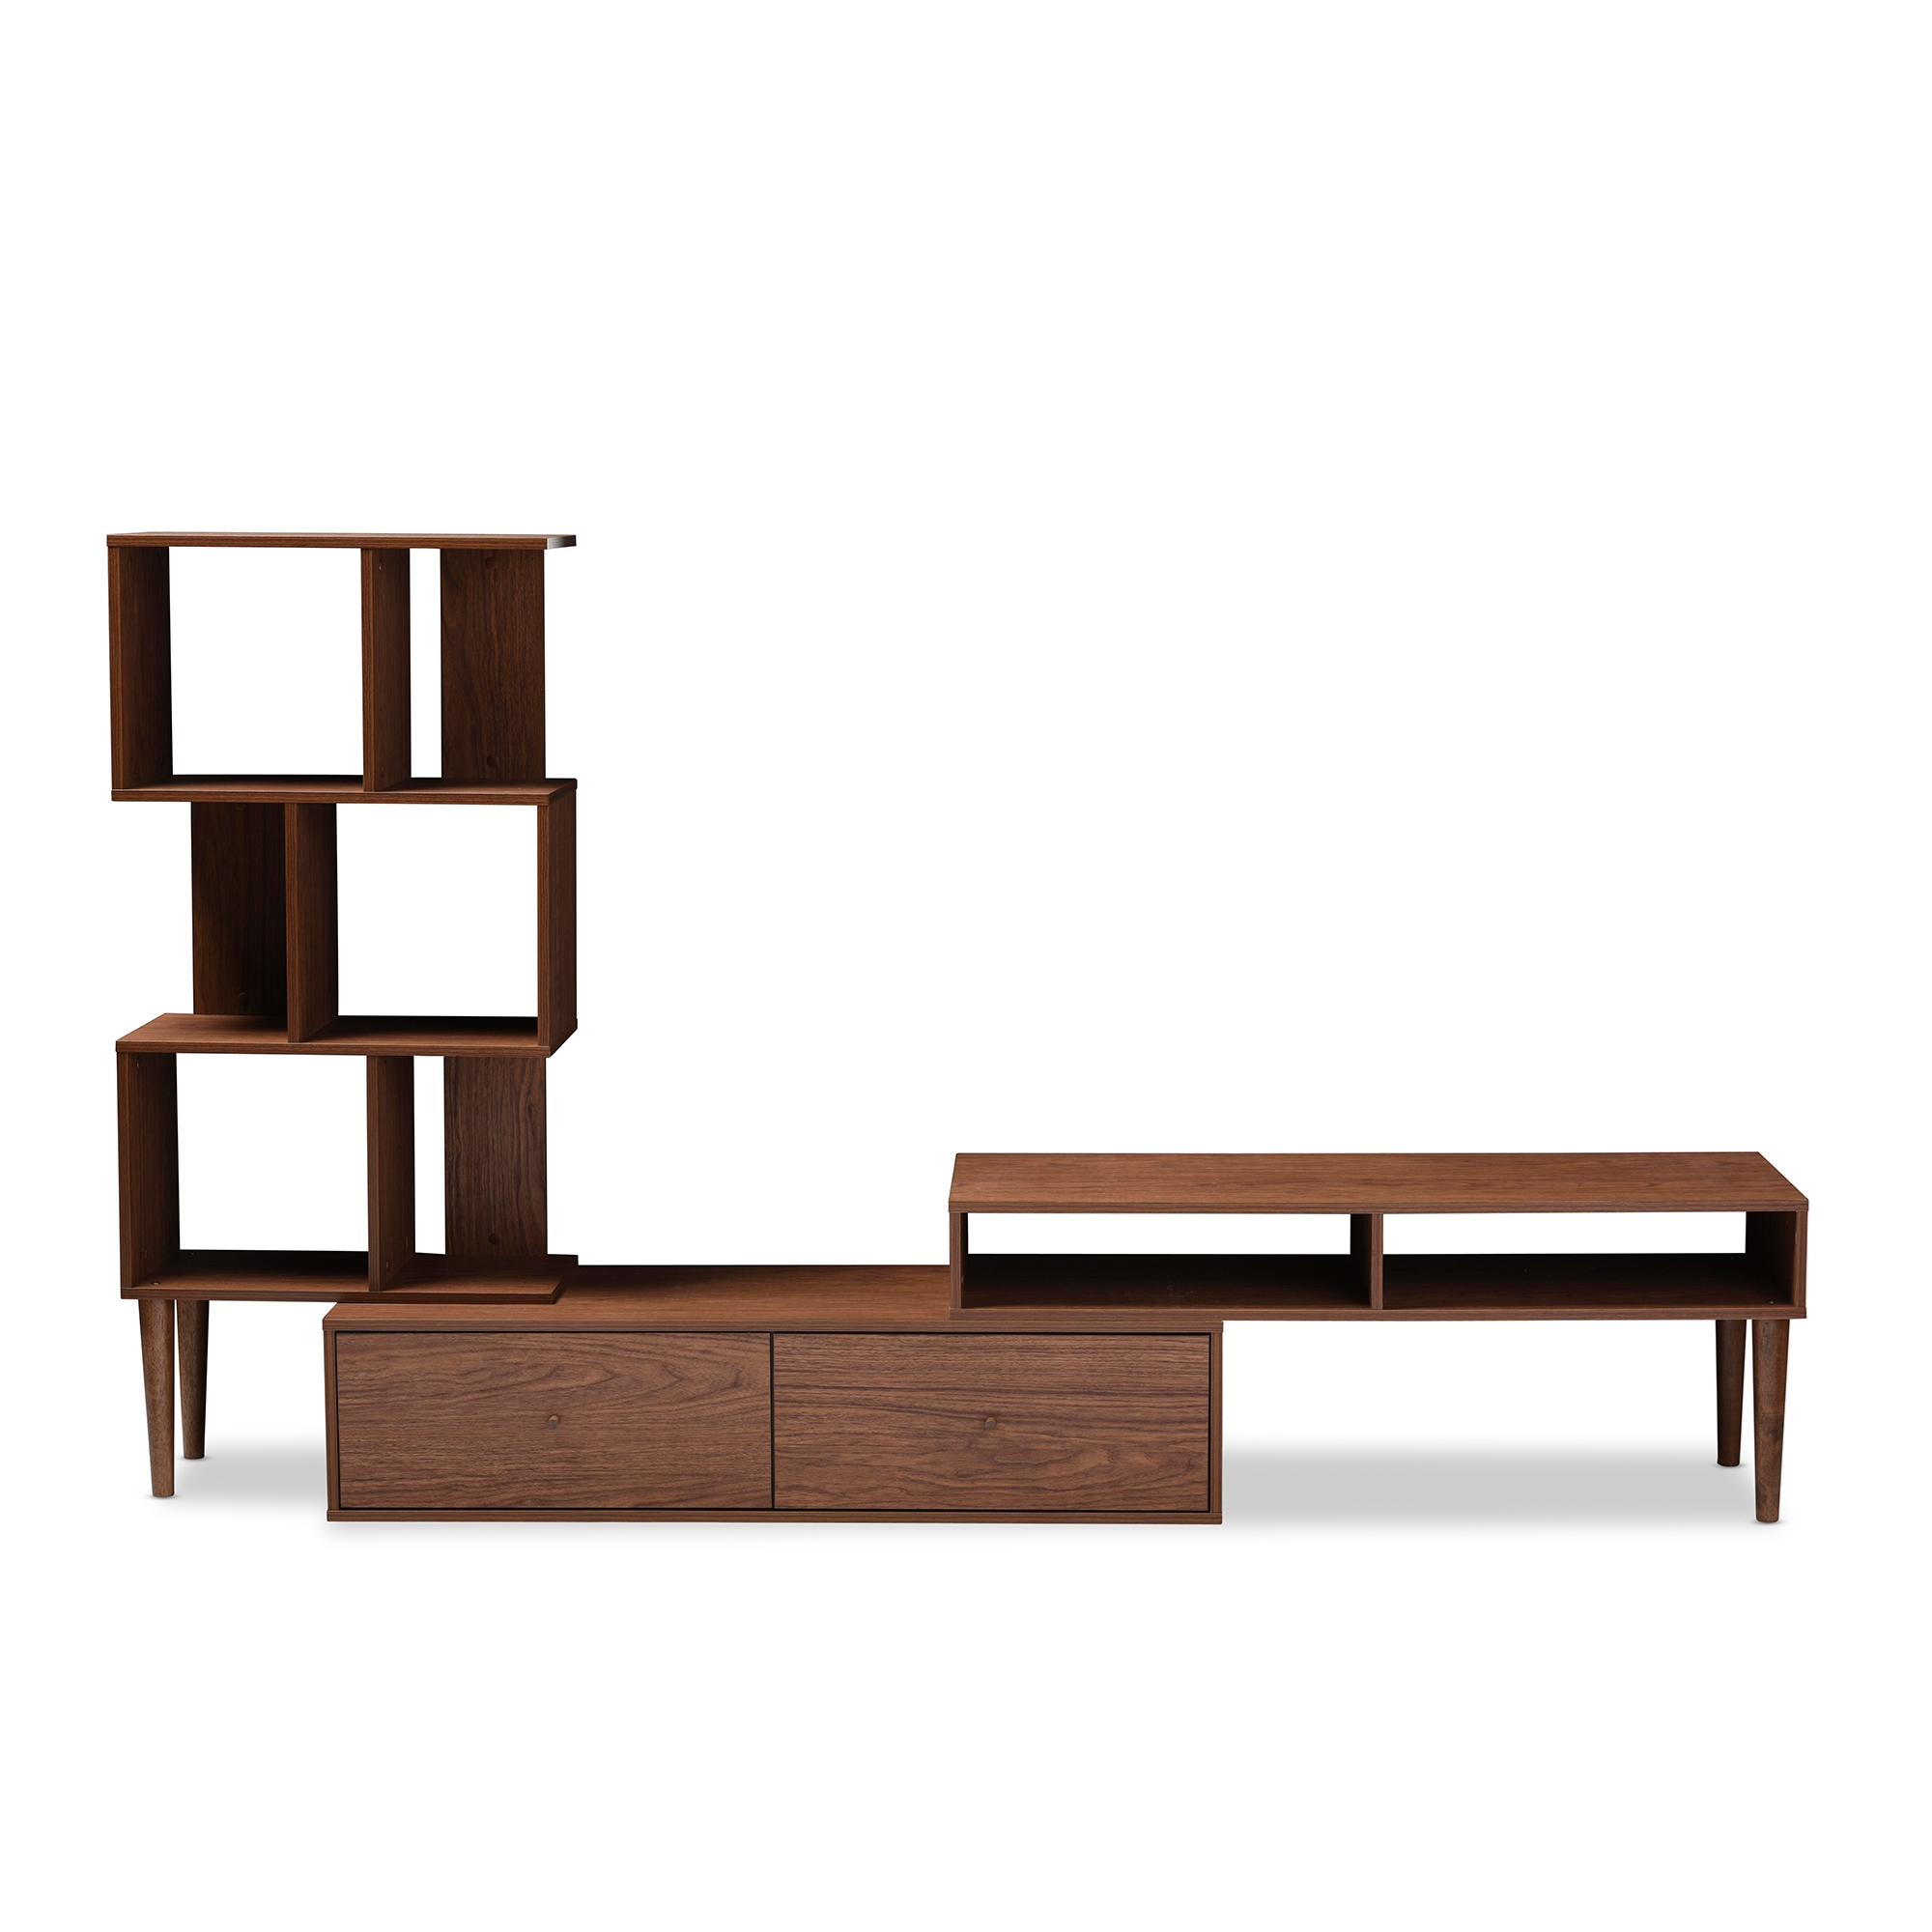 Entertainment CentersLiving Room FurnitureAffordable Modern